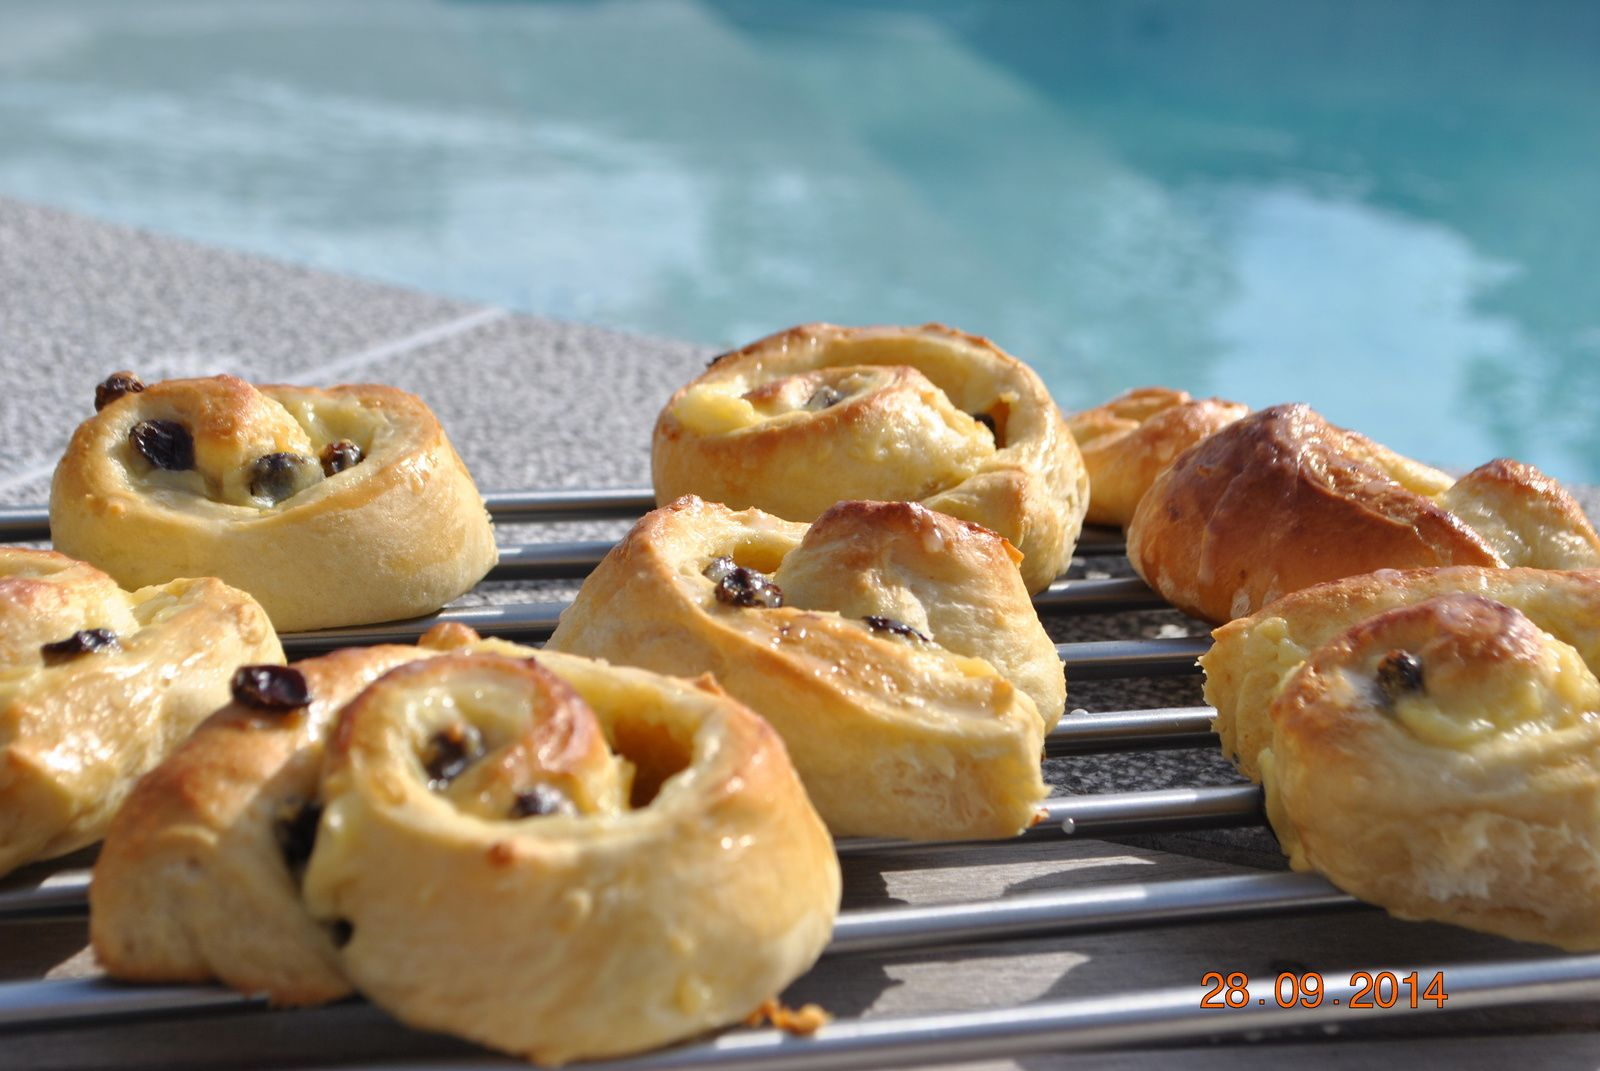 Escargots briochés a la crème pâtissière, aux raisins secs/pralines roses